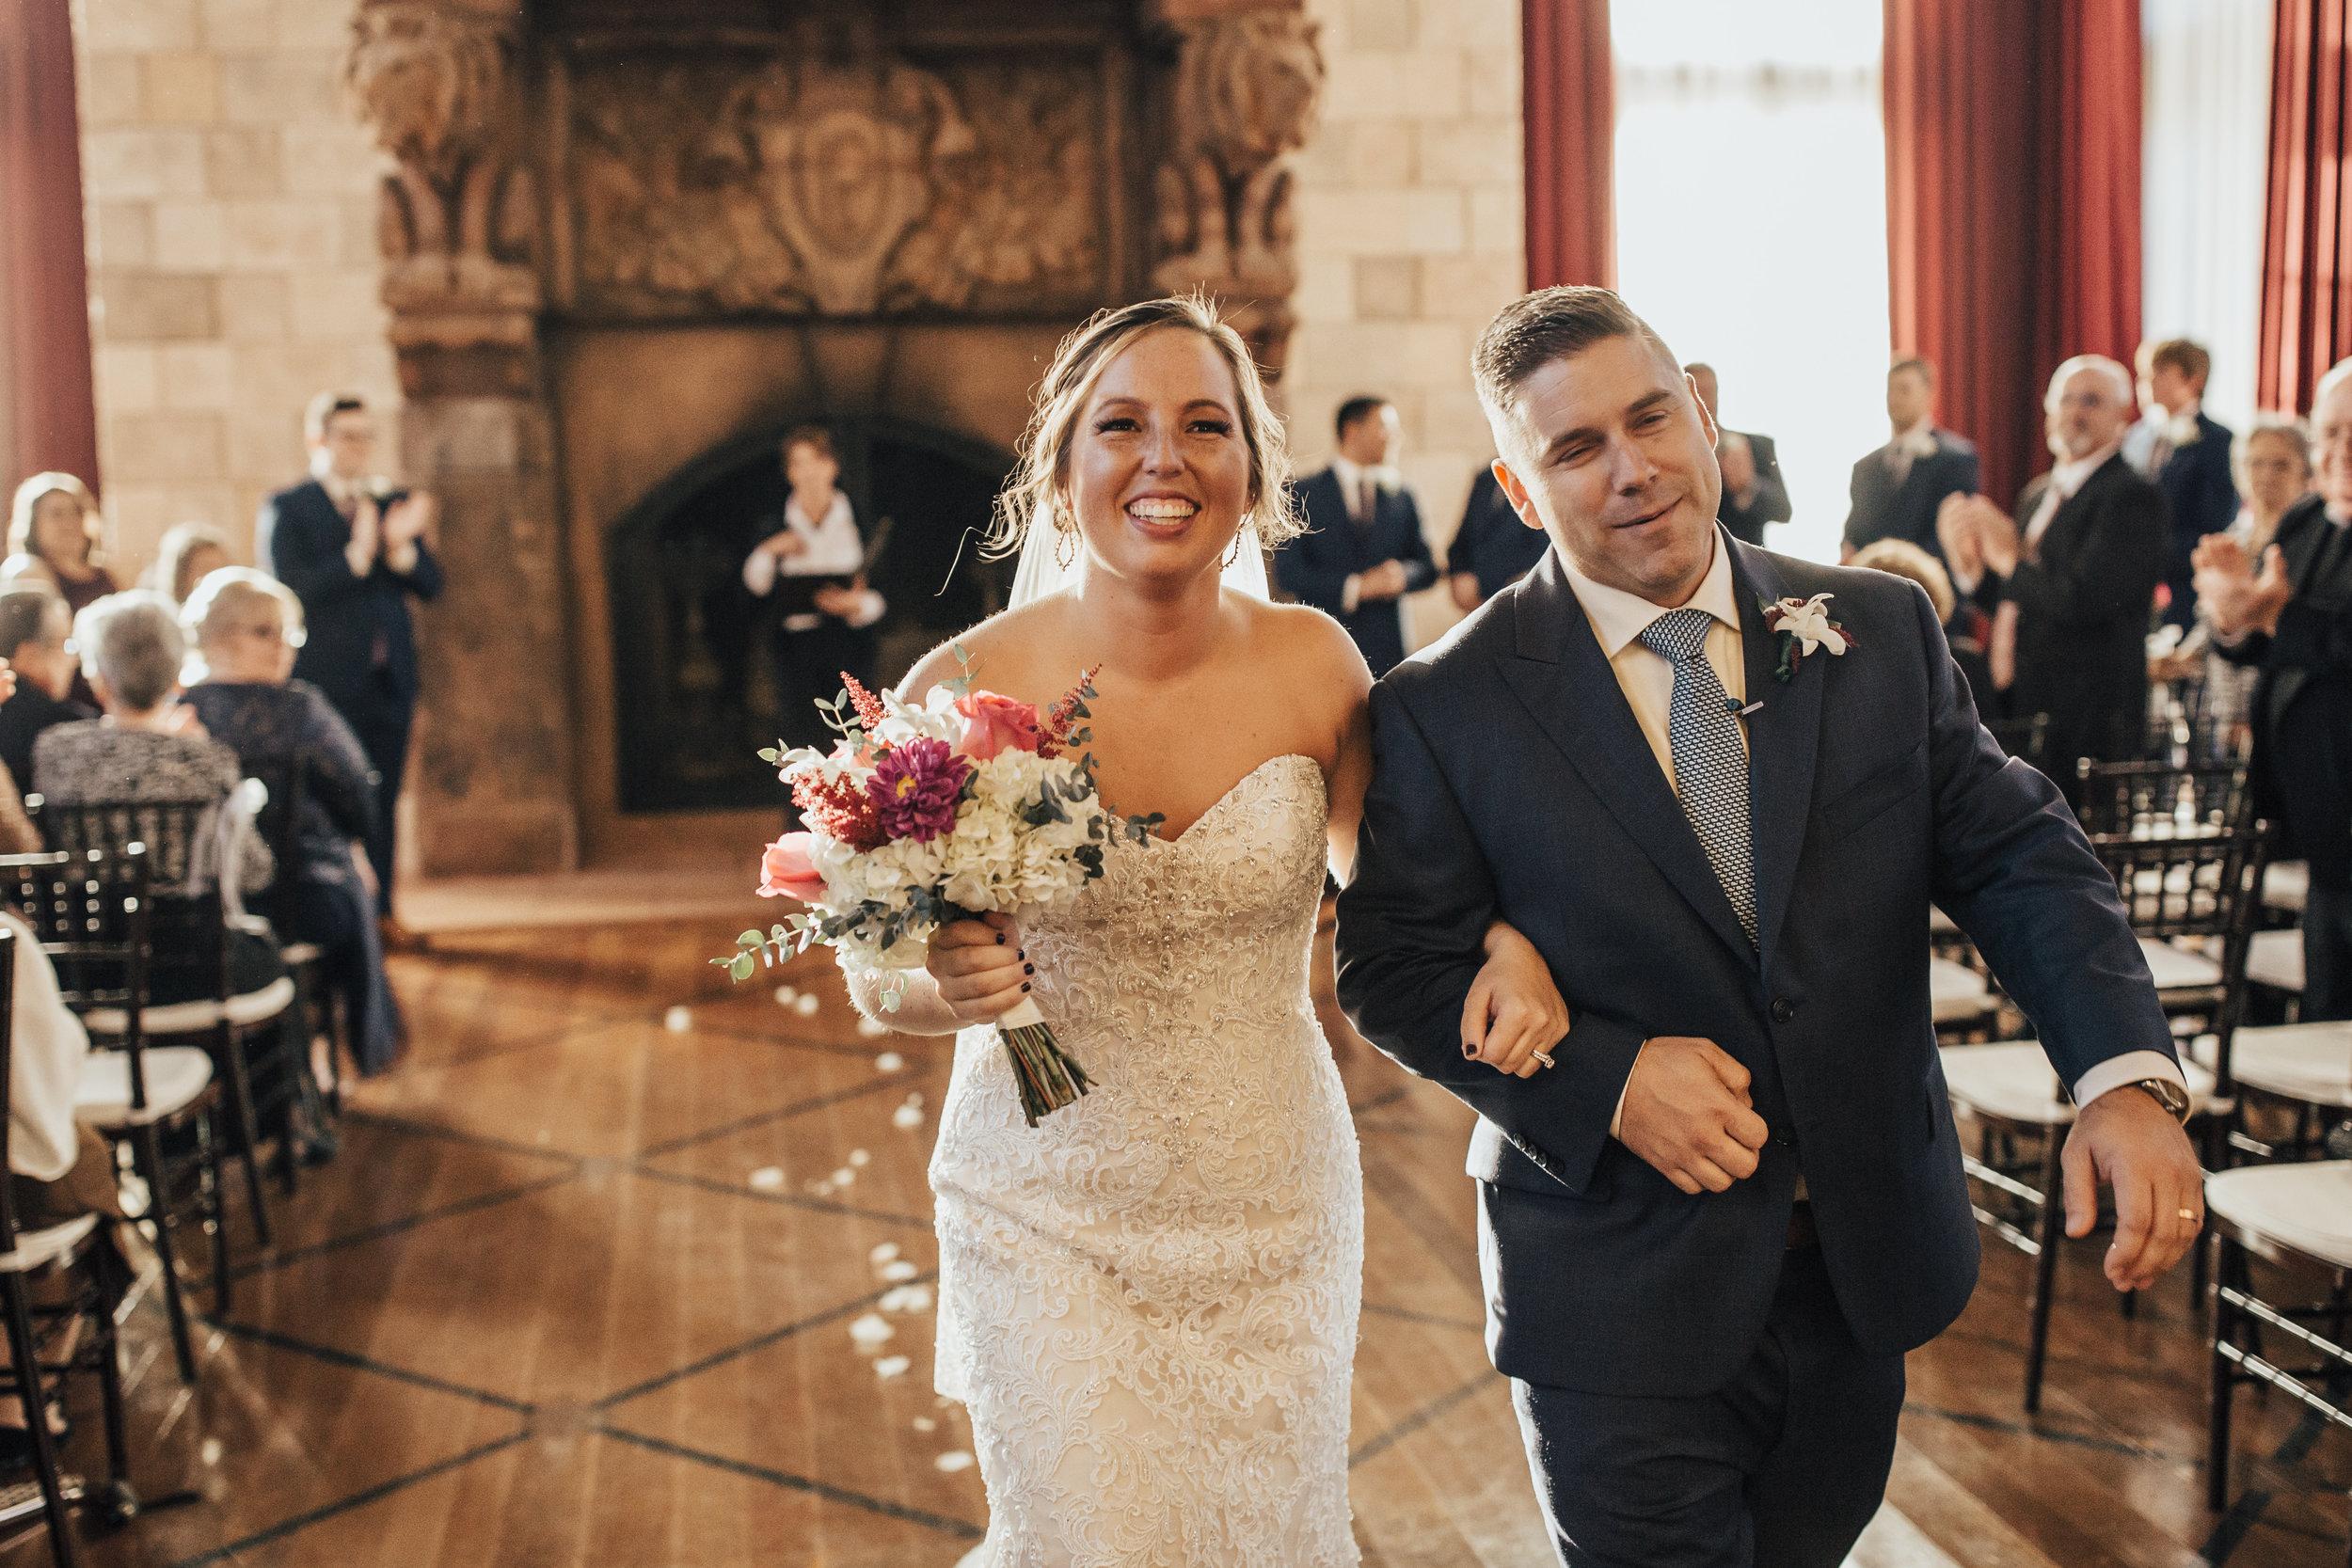 allie_justin-dover-hall-estate-wedding-2018-peytoncurry-1255.jpg